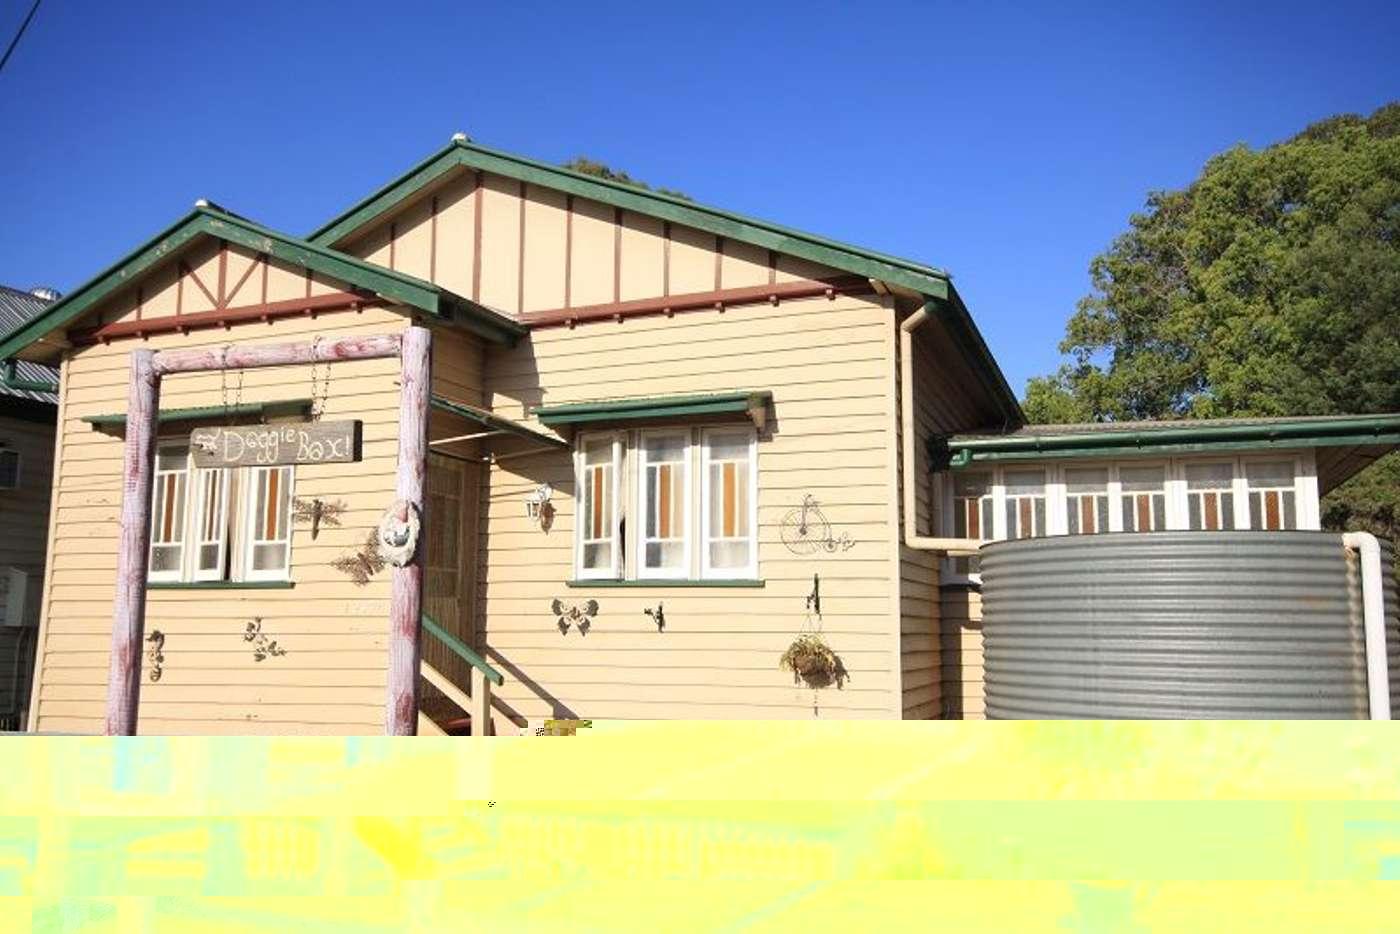 Main view of Homely house listing, 12174 Bunya Highway, Memerambi QLD 4610